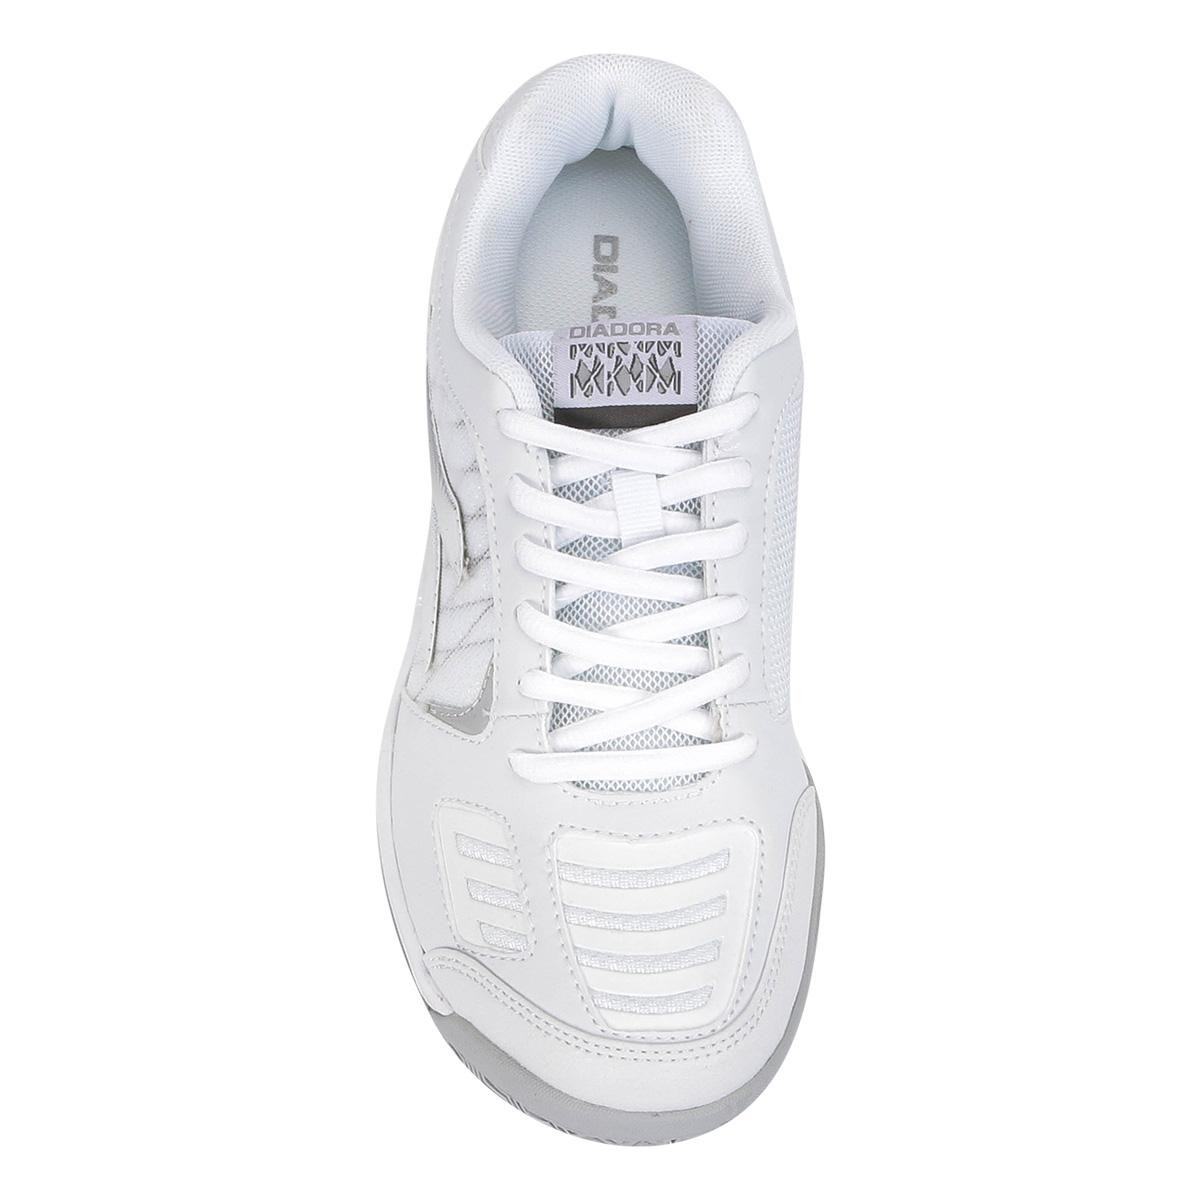 81fcef206f6 tênis diadora hi supreme 3 feminino - cor branco+prata. Carregando zoom.